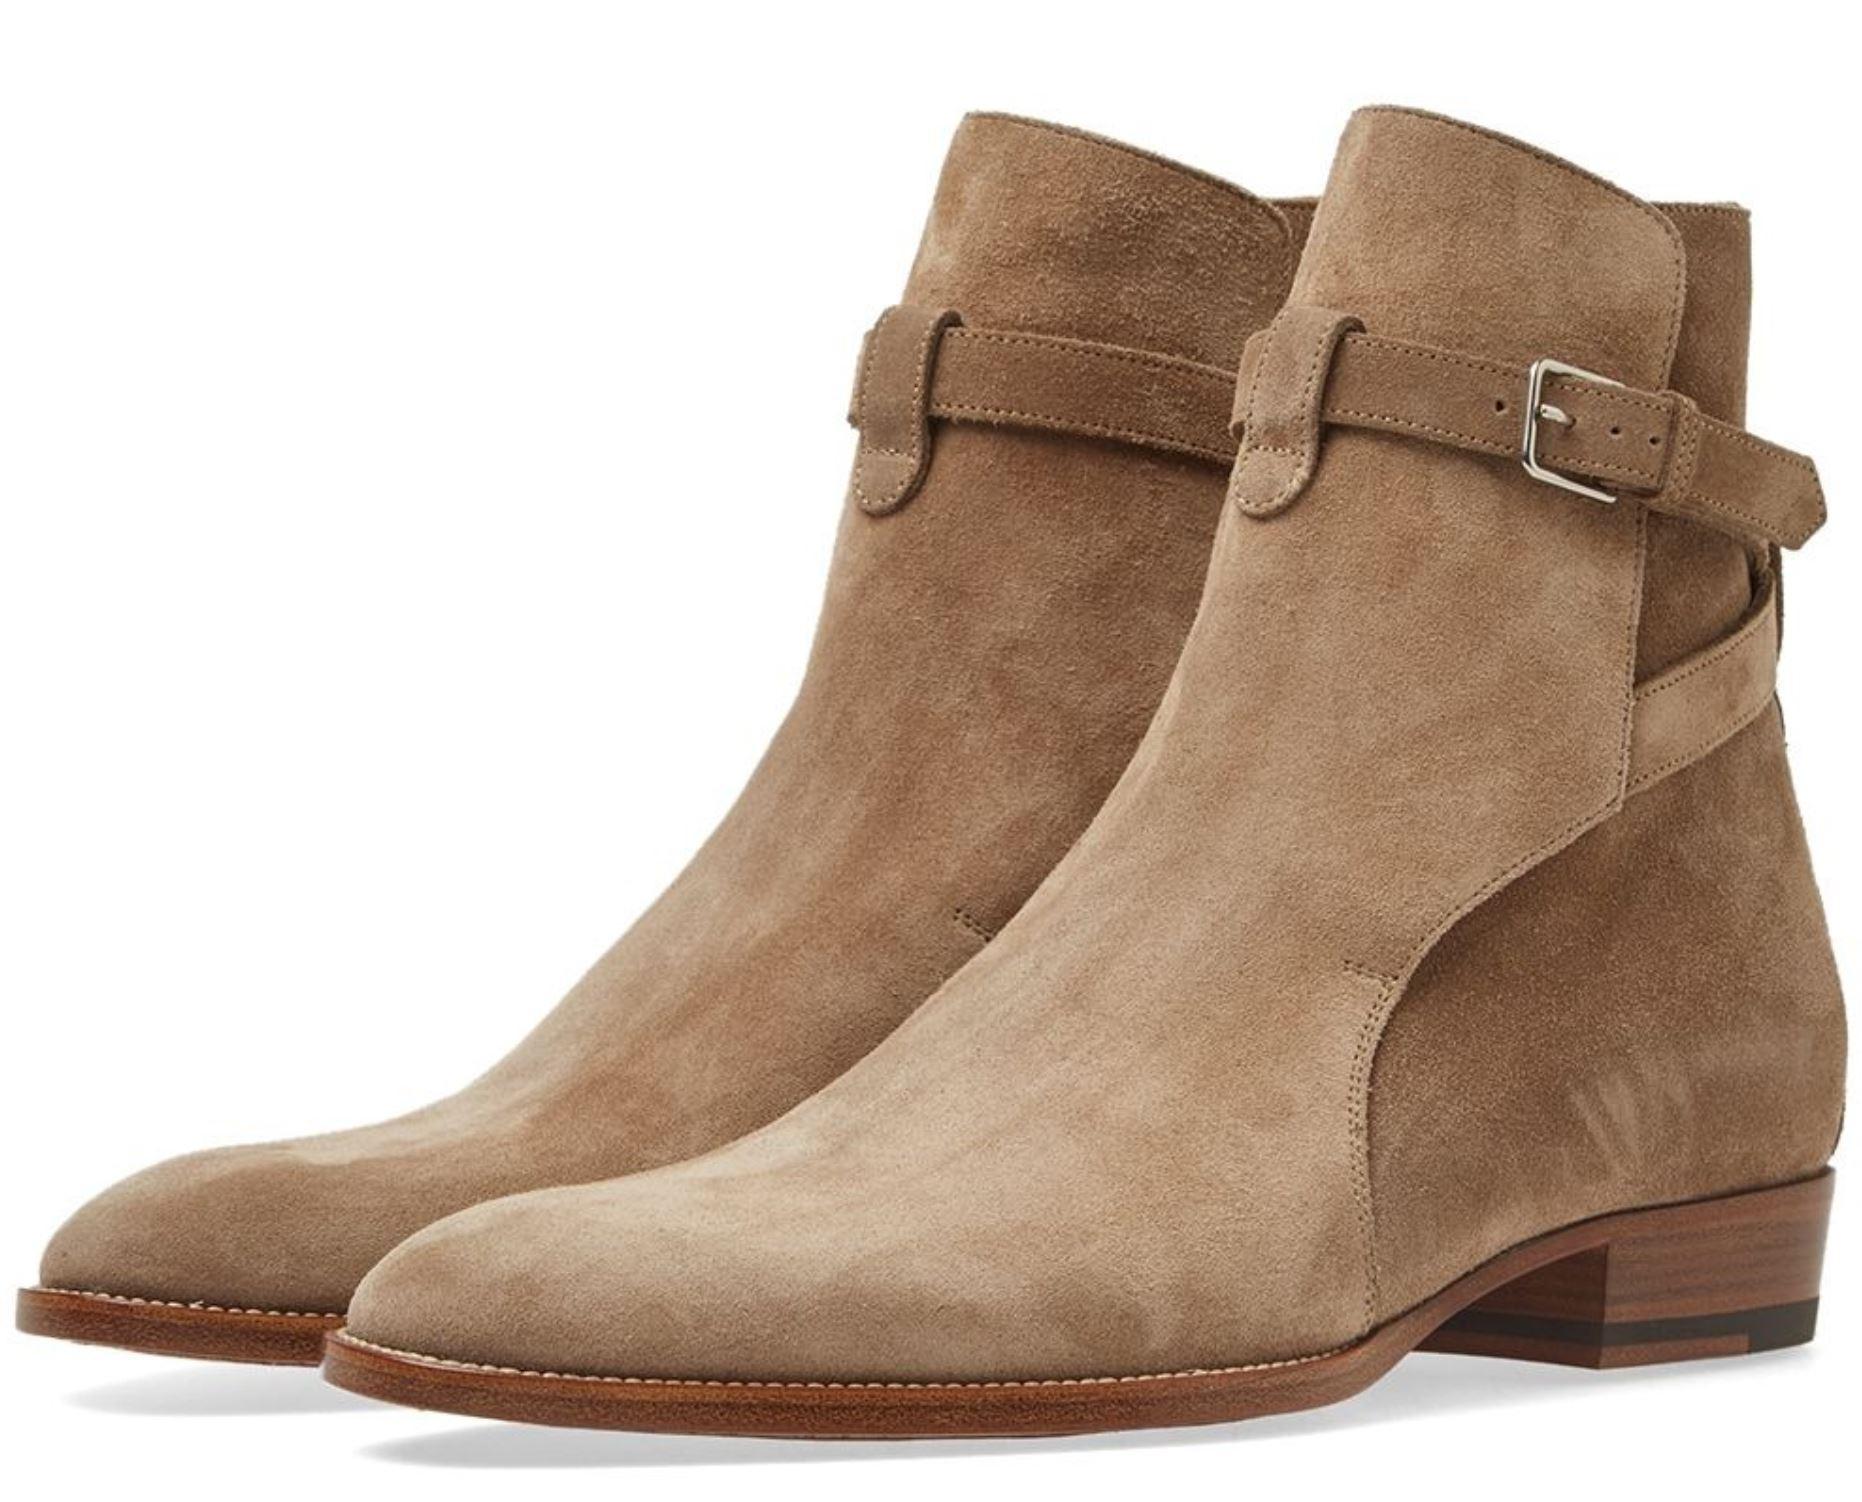 Saint Laurent Jodhpur Boots from endclothing.com